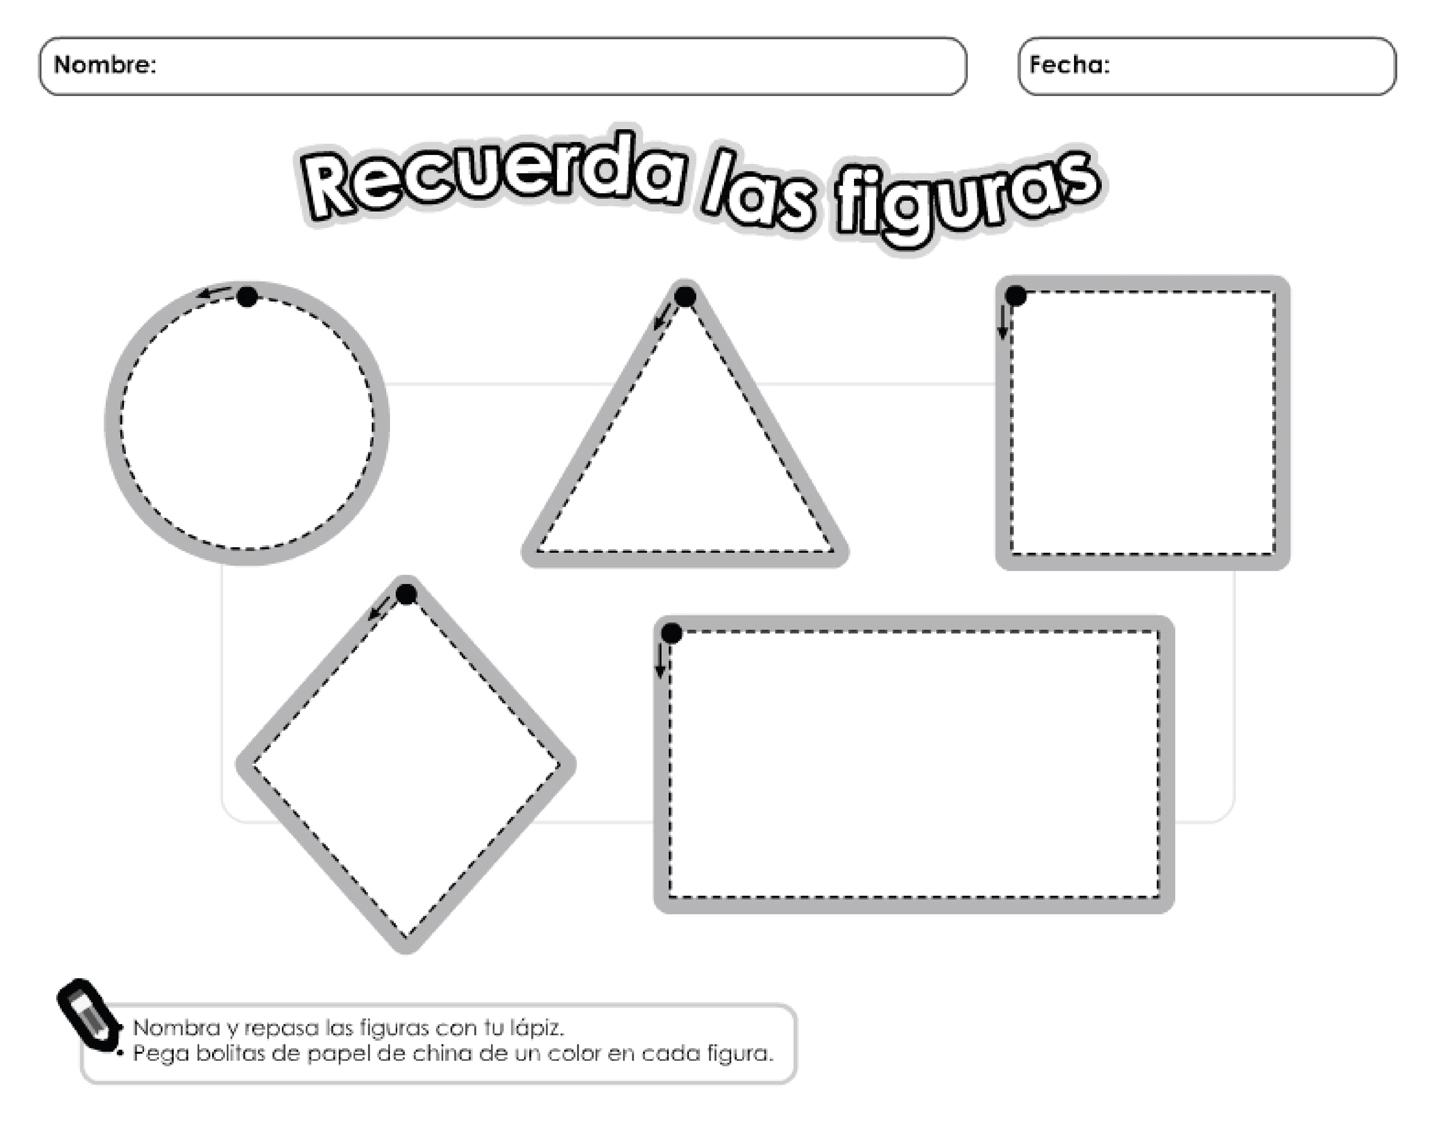 Figuras divertidas for Las formas geometricas